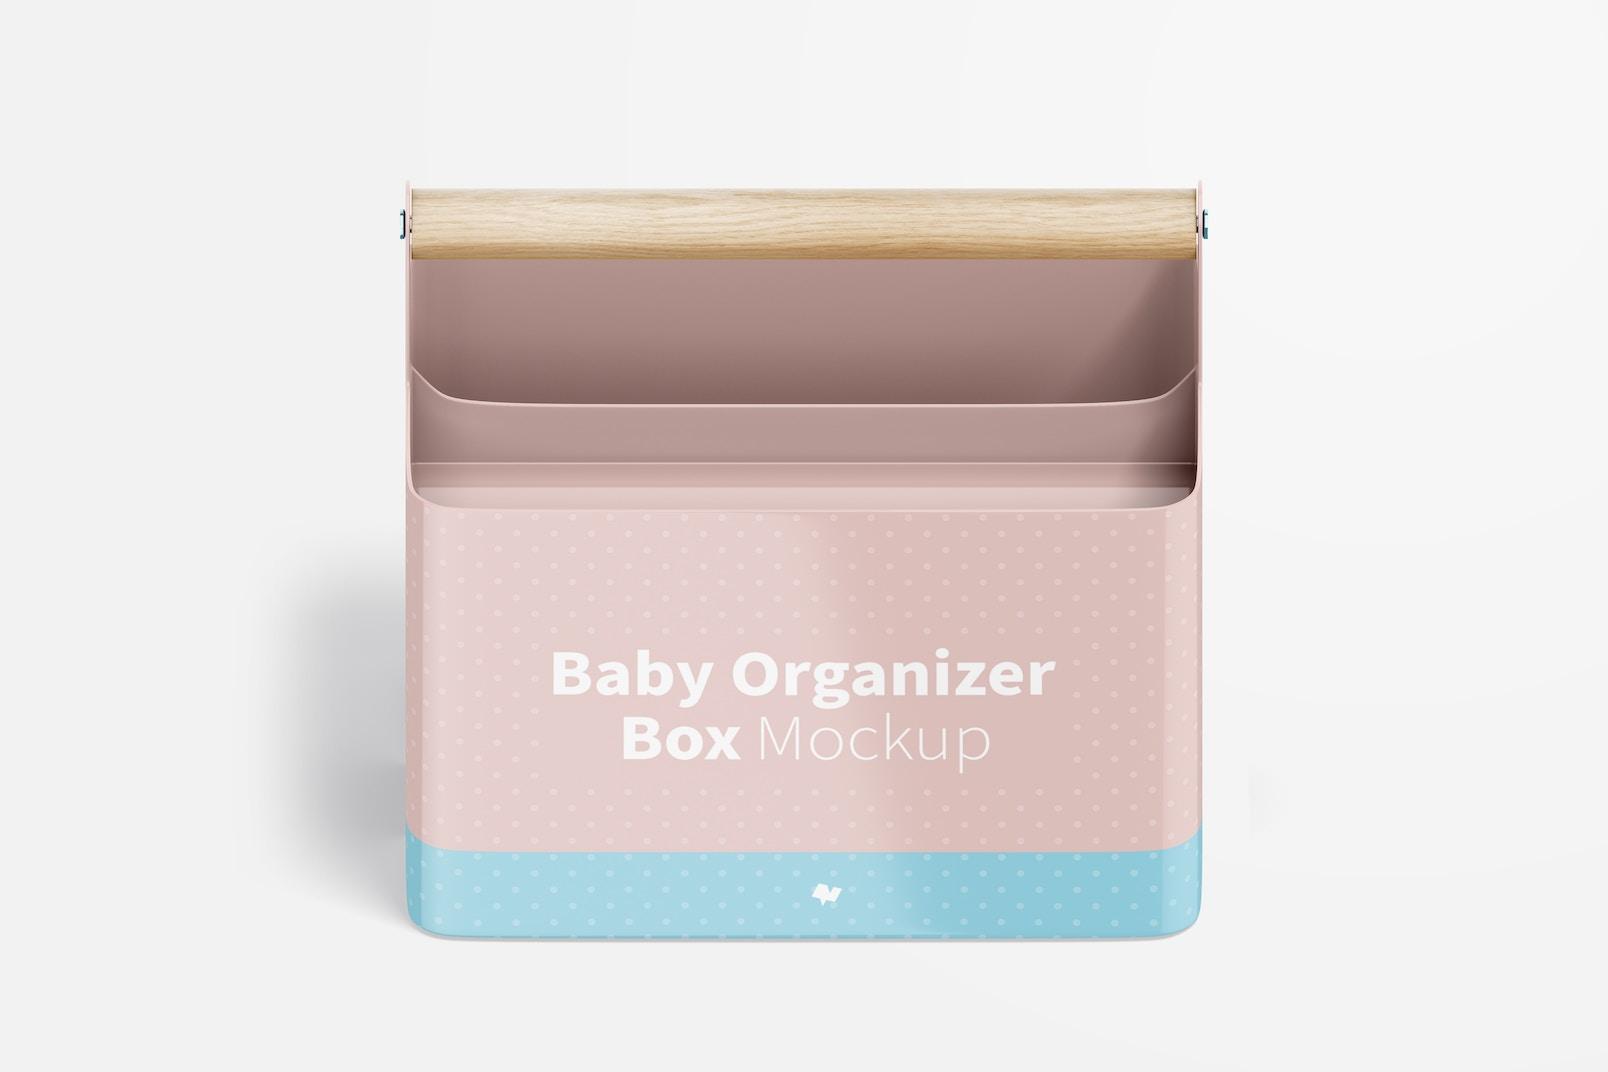 Baby Organizer Box Mockup, Isometric Front View